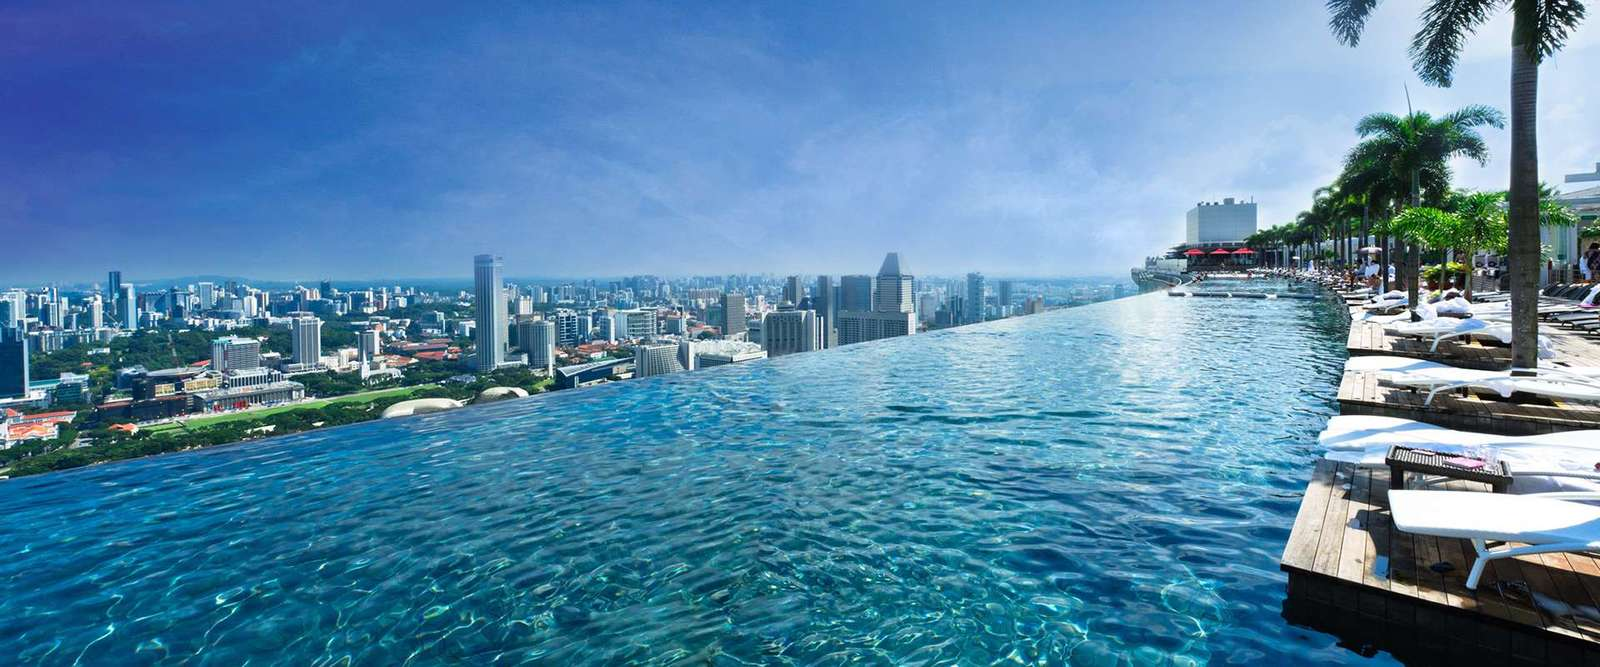 Marina Bay Sands Hotel Na Hranici Fantazie A Reality Luxury Prague Life